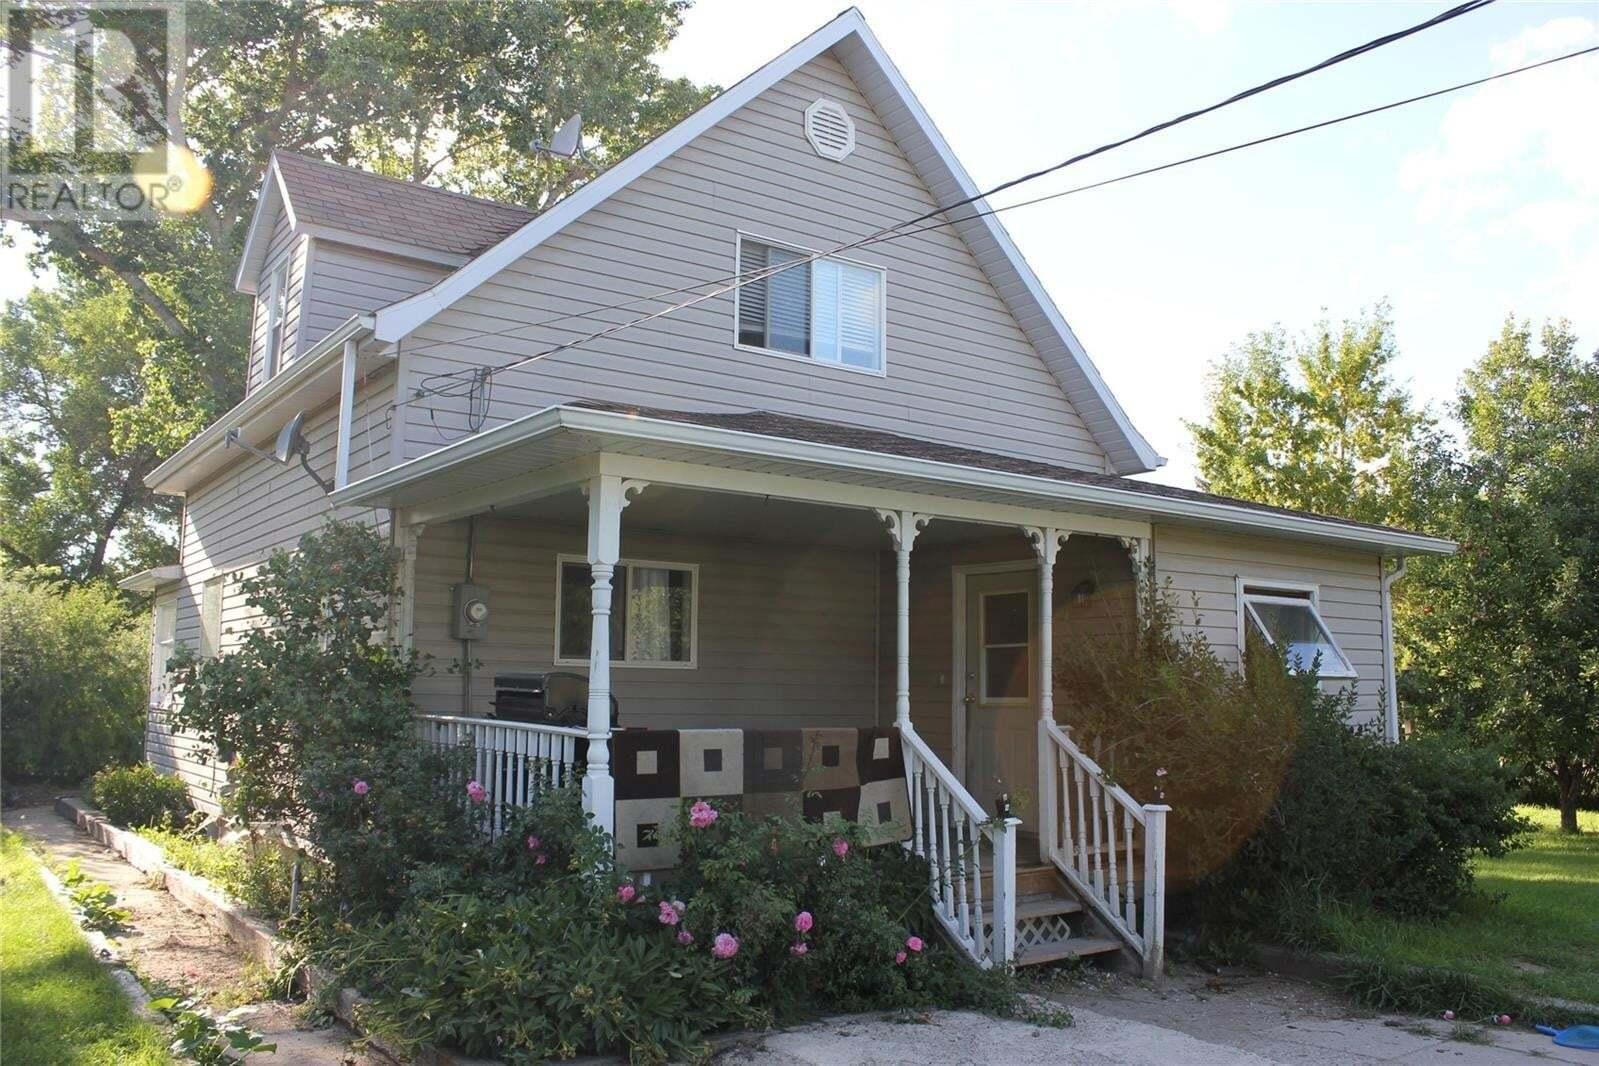 House for sale at 331 Dennis St Herbert Saskatchewan - MLS: SK815386